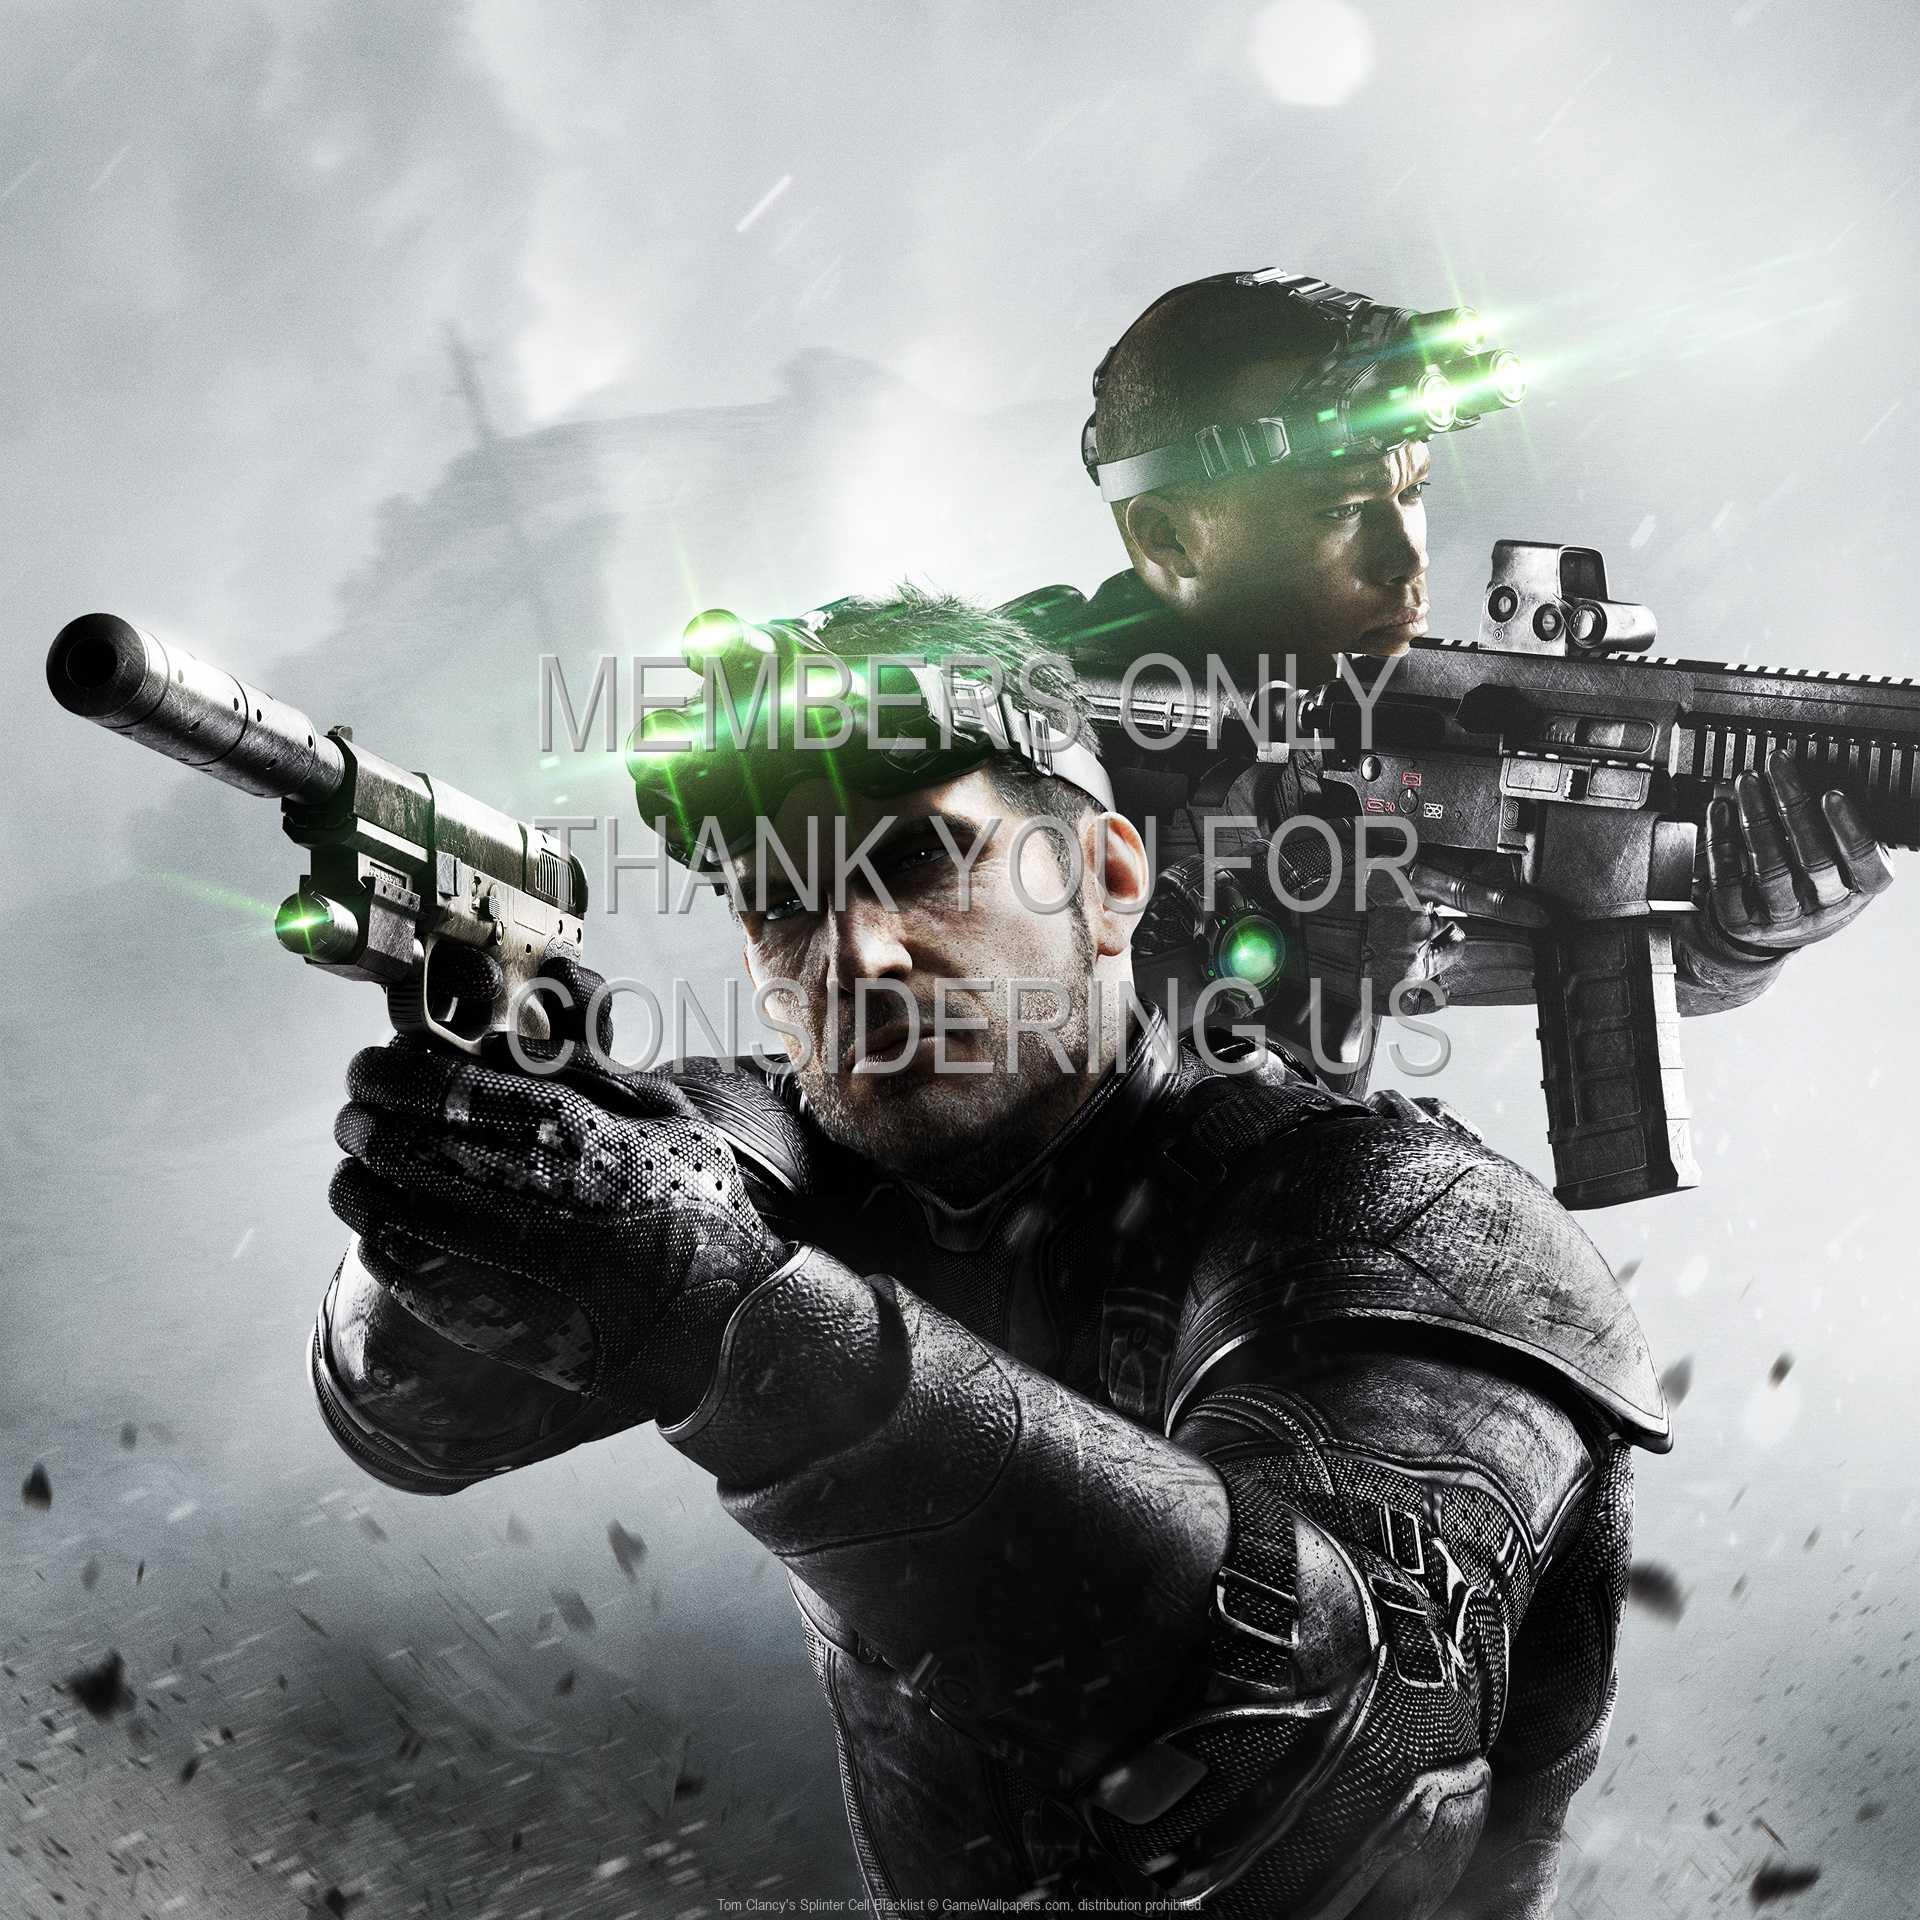 Tom Clancy's Splinter Cell: Blacklist 1080p Horizontal Handy Hintergrundbild 06